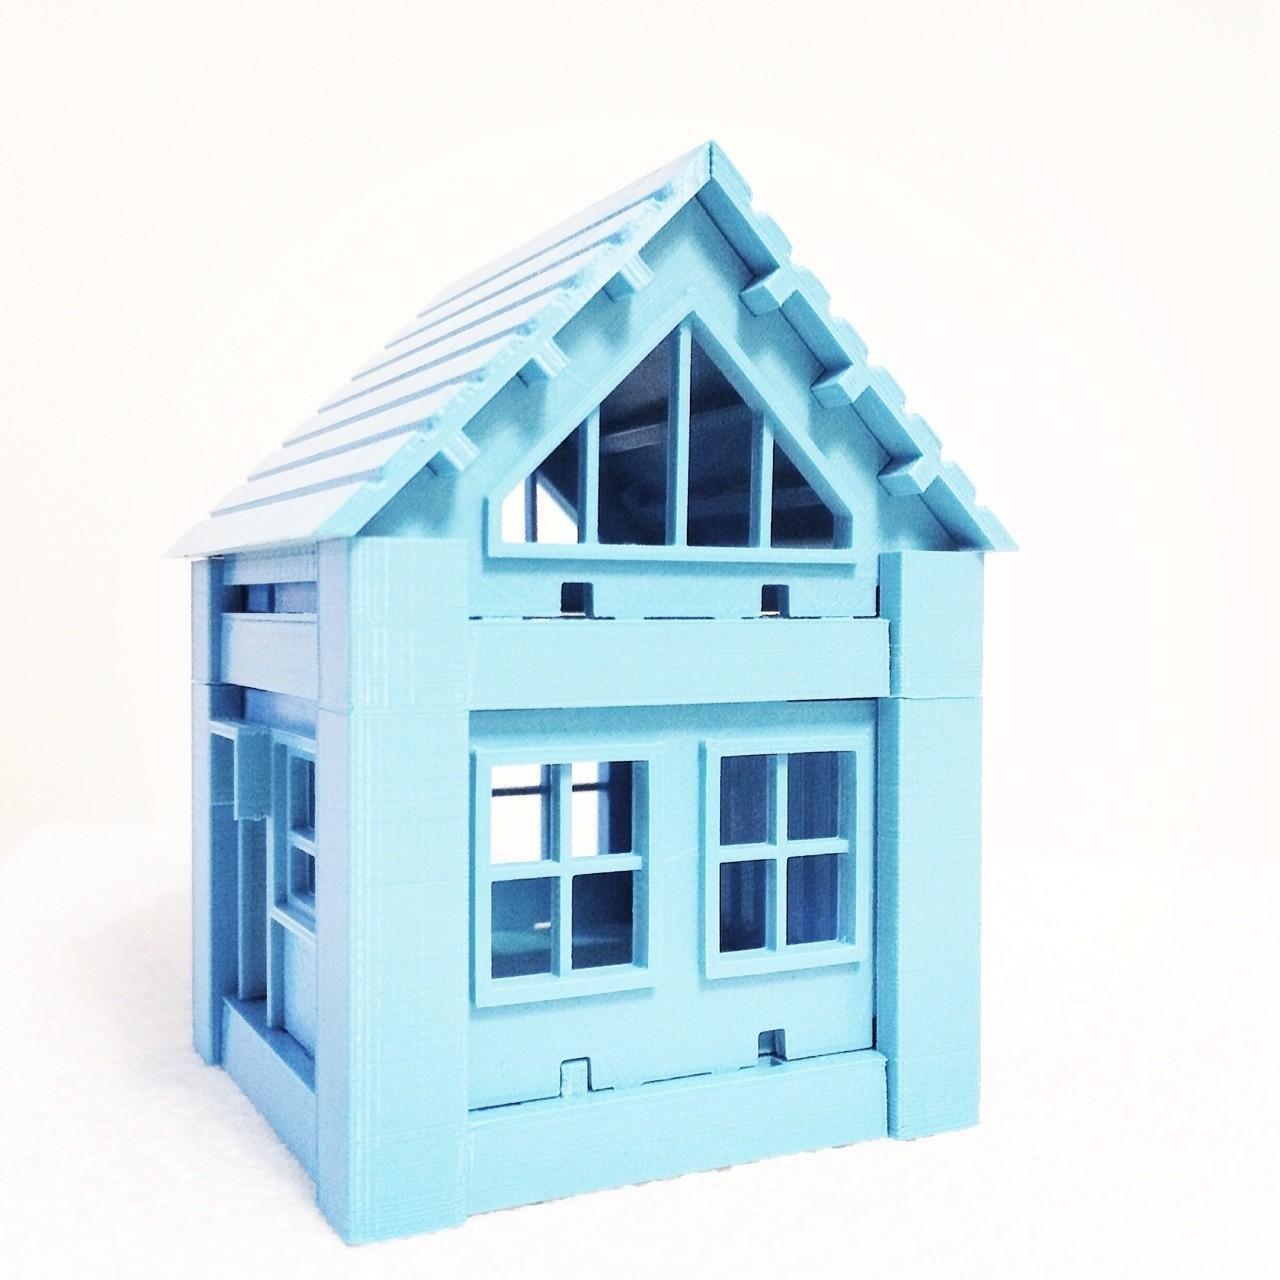 photo_3.jpg Download STL file Printable Architectural Kit 1 • 3D print design, ArchitectureKIT